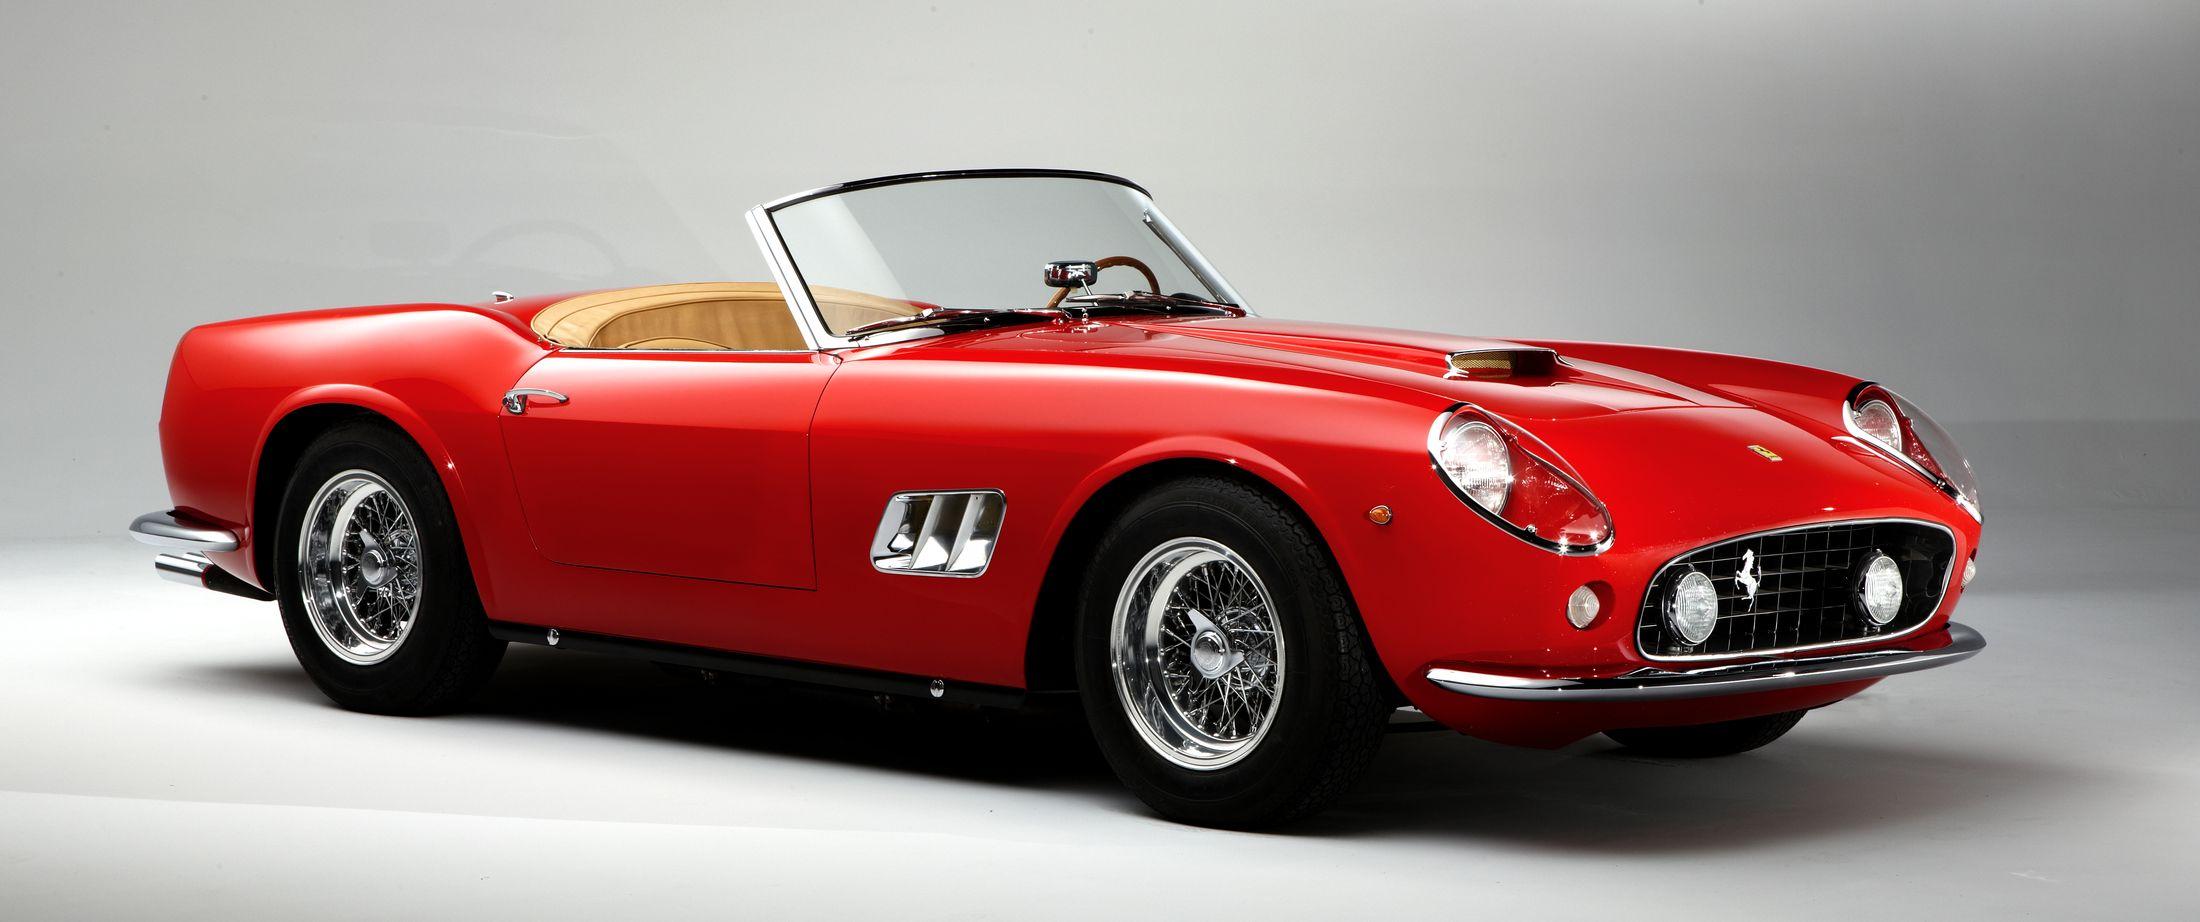 1961 Ferrari 250 GT California widescreen wallpapers